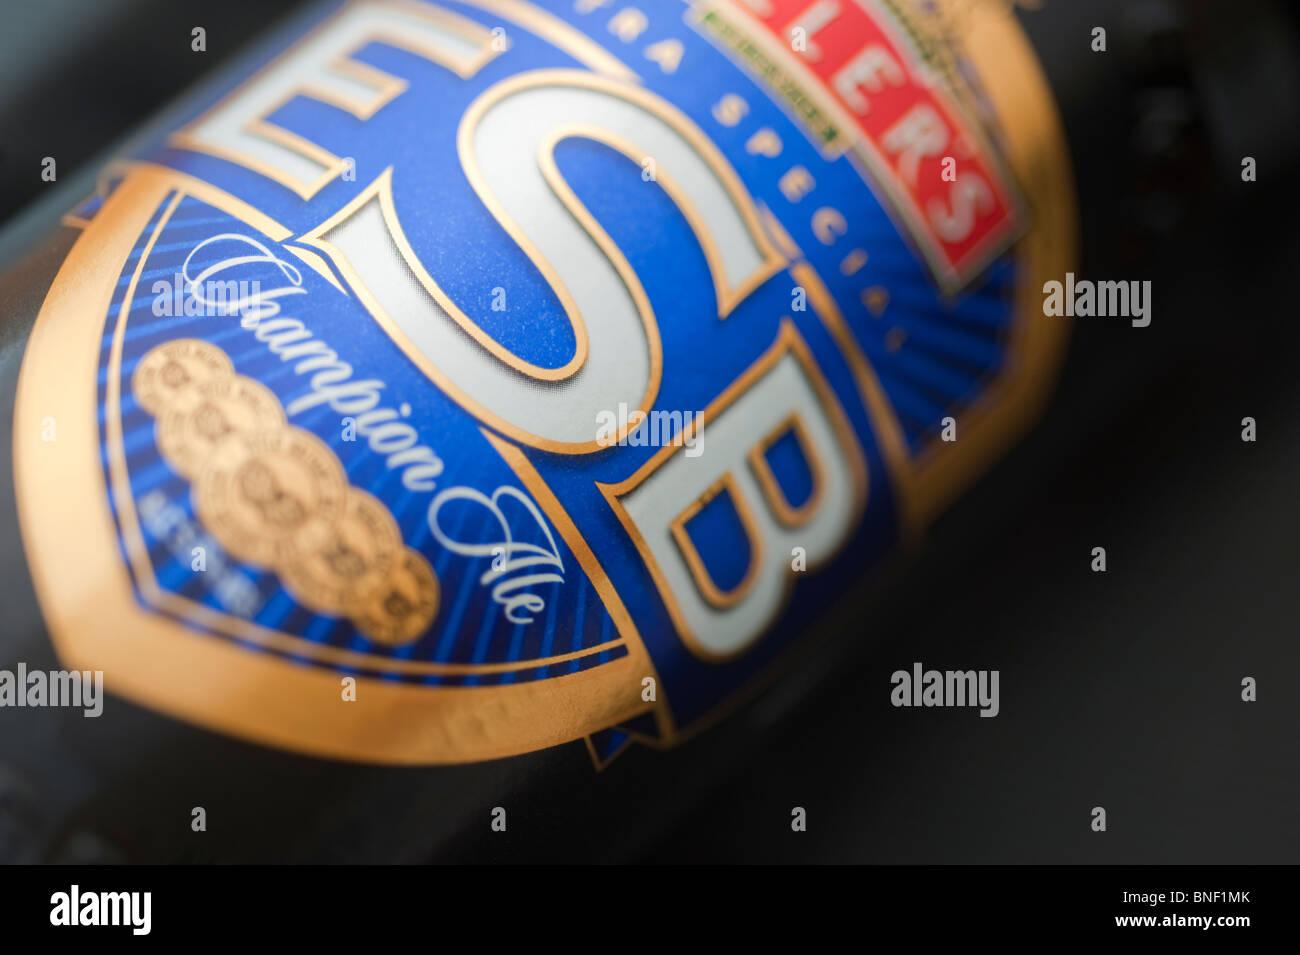 Fullers ESB beer bottle label, closeup - Stock Image